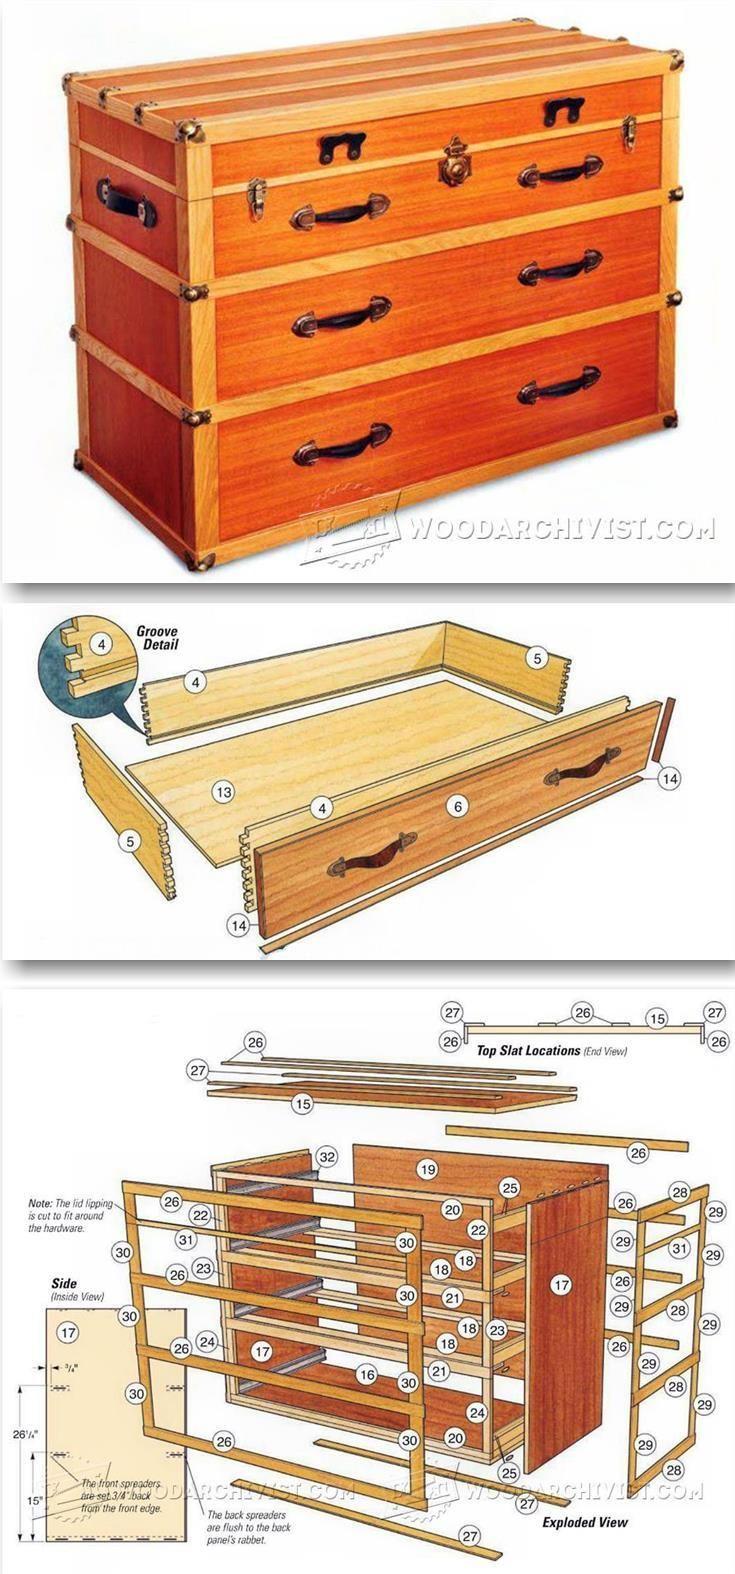 Steamer Trunk Dresser Plans - Furniture Plans and Projects | WoodArchivist.com